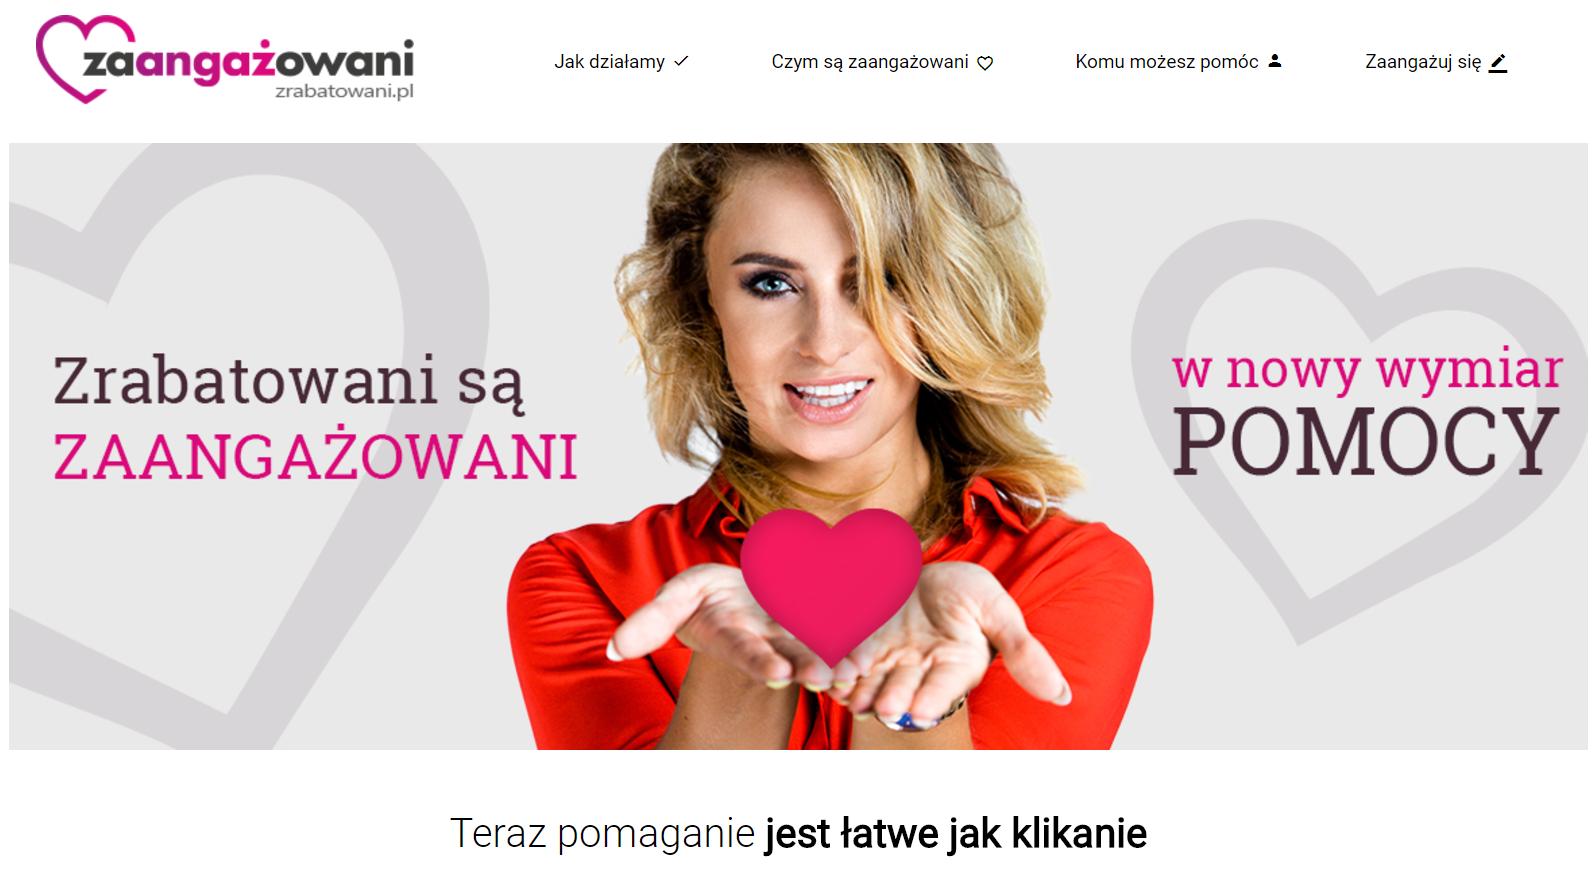 Zrabatowani.pl_Zaangazowani_www